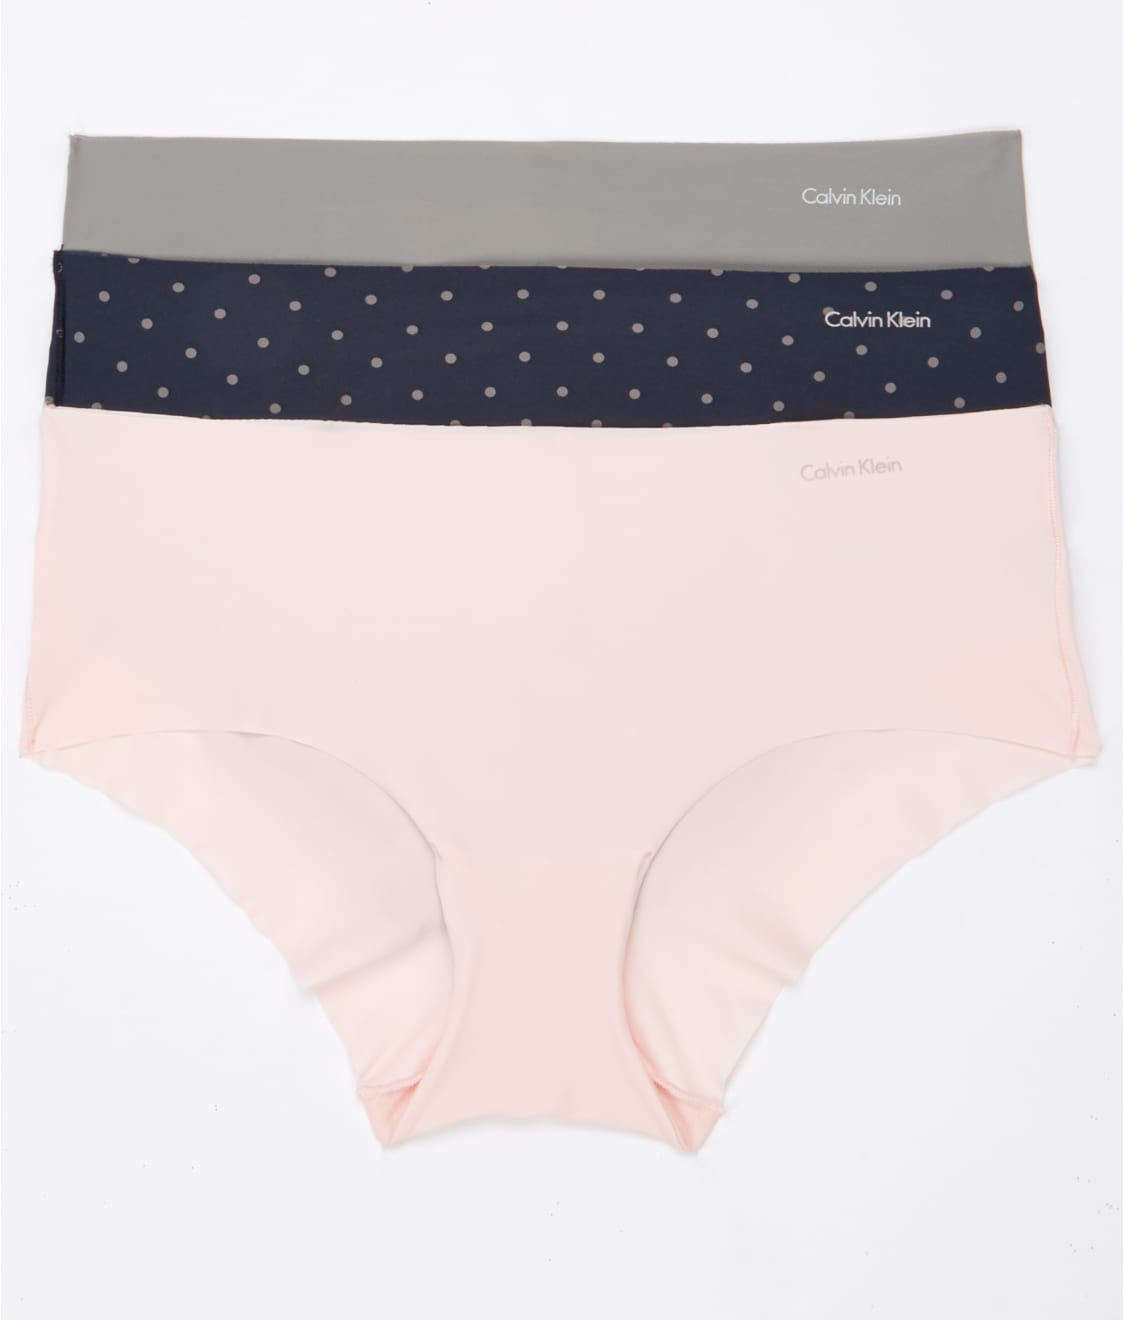 a992da1847ab Calvin Klein Invisibles Hipster 3-Pack   Bare Necessities (QD3559)